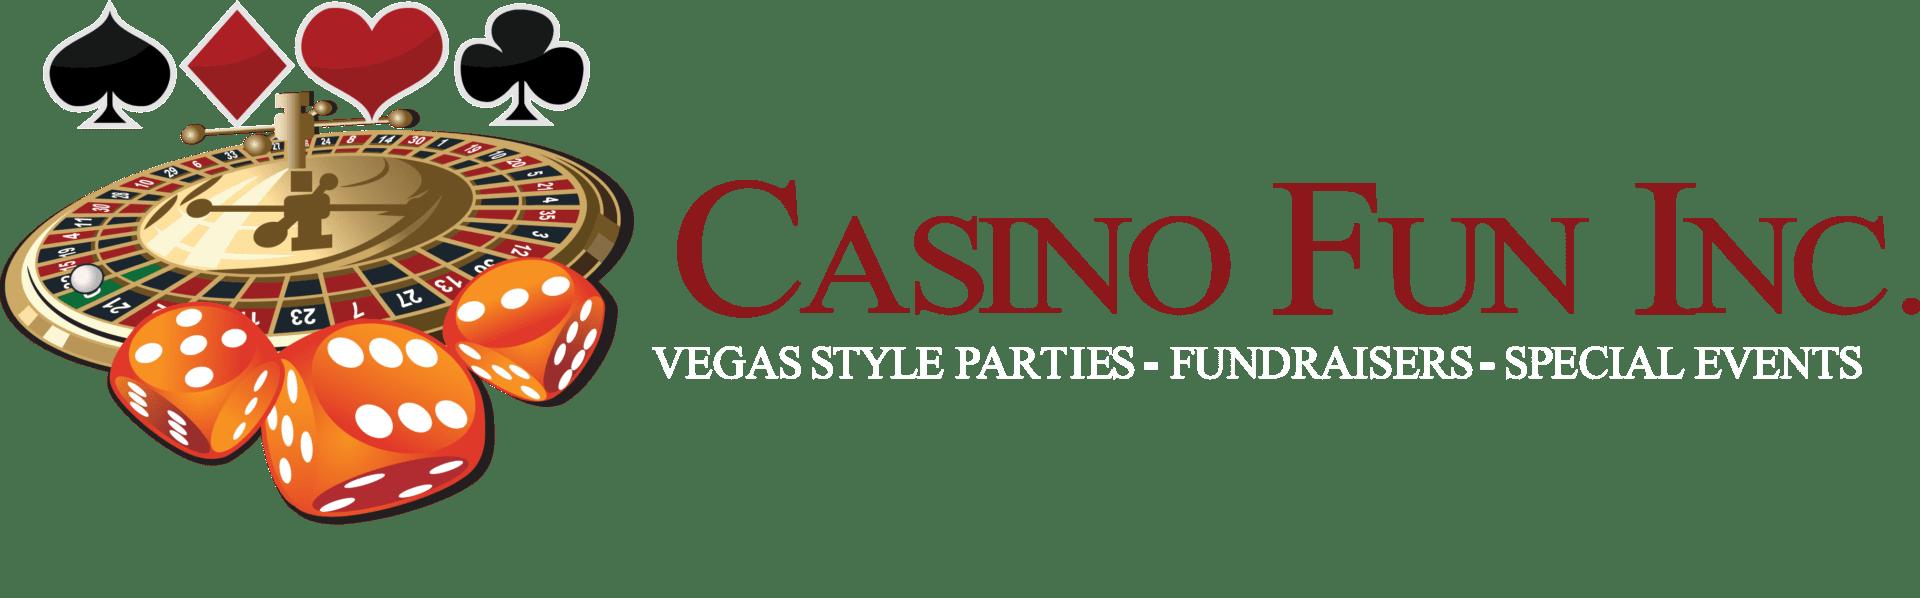 Casino_Fun_final